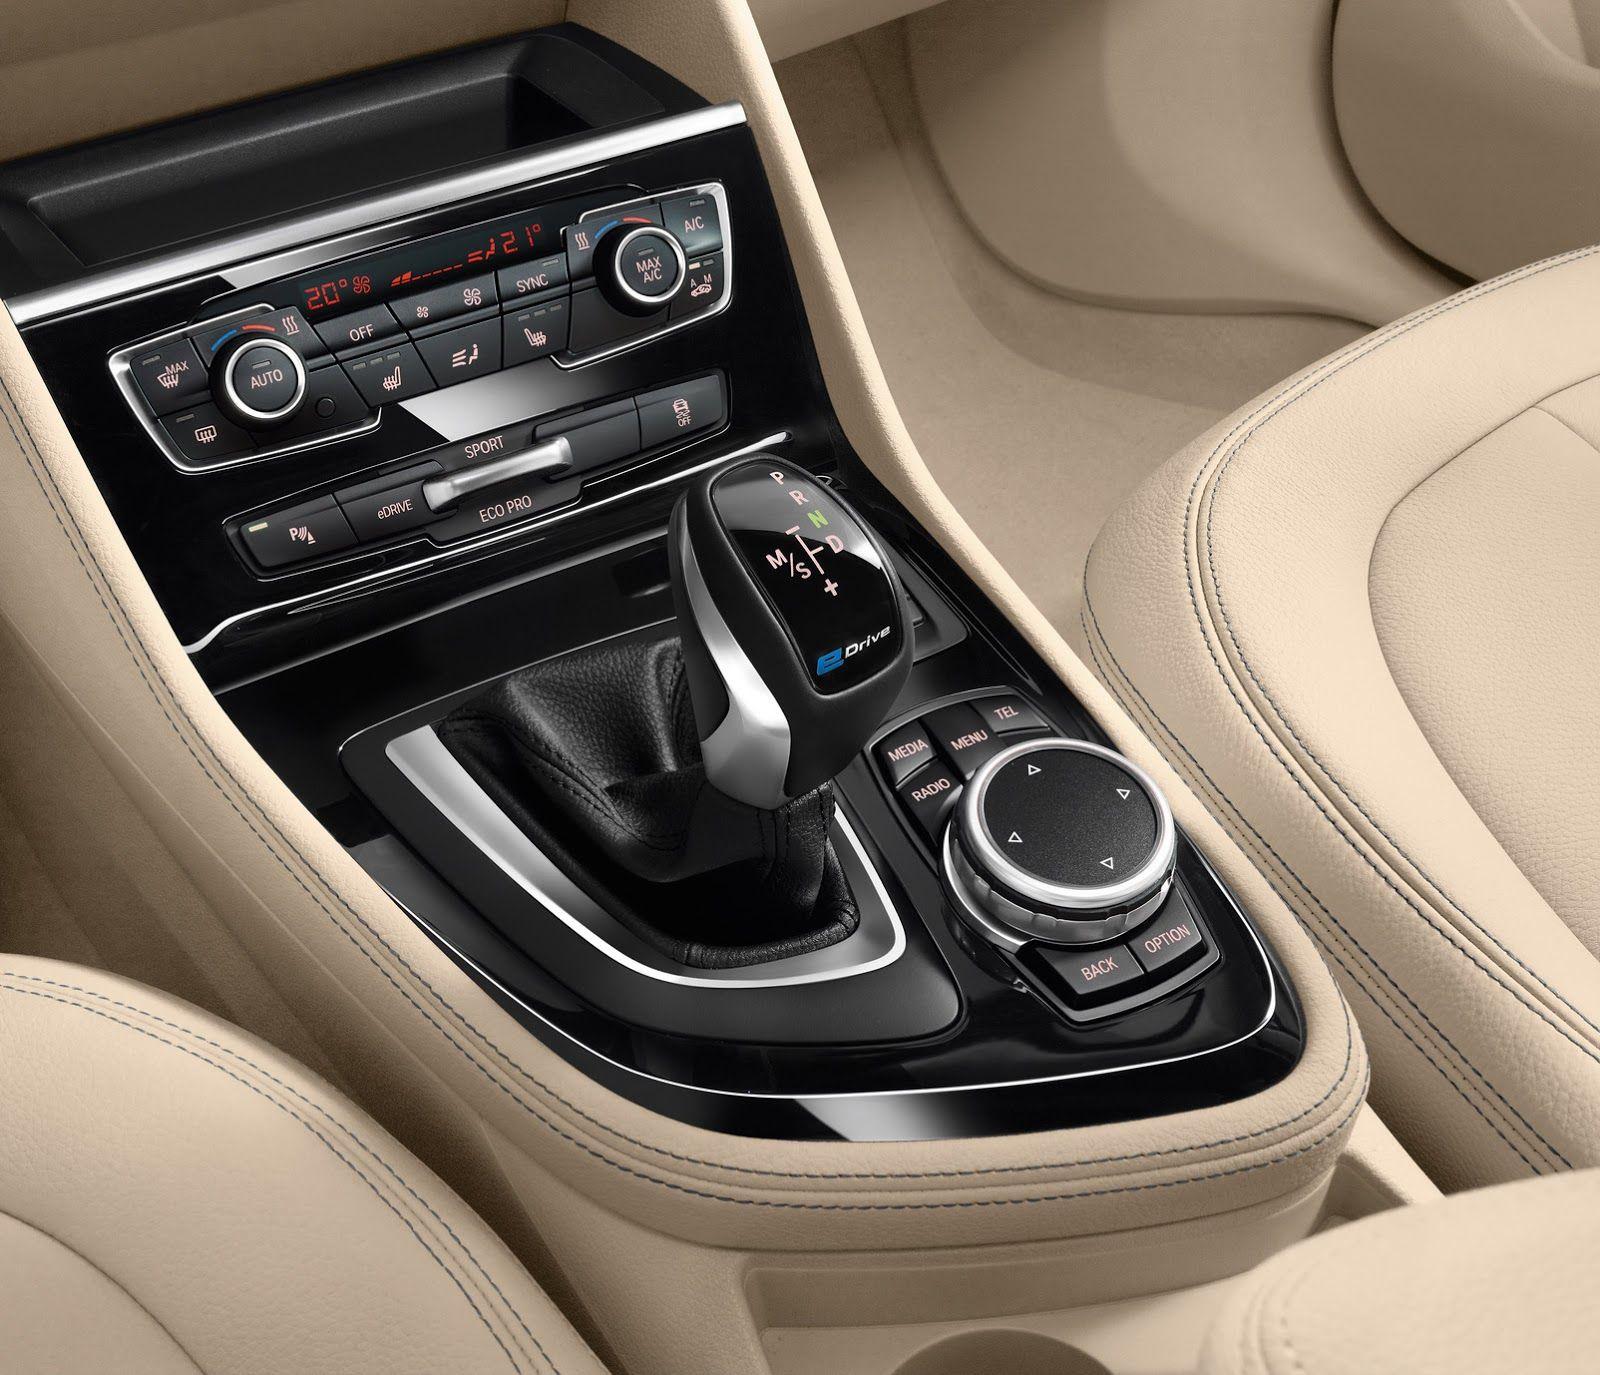 New Bmw 225xe Active Tourer Is An Awd Plug In Hybrid Minivan Carscoops New Bmw Bmw Hybrid Bmw